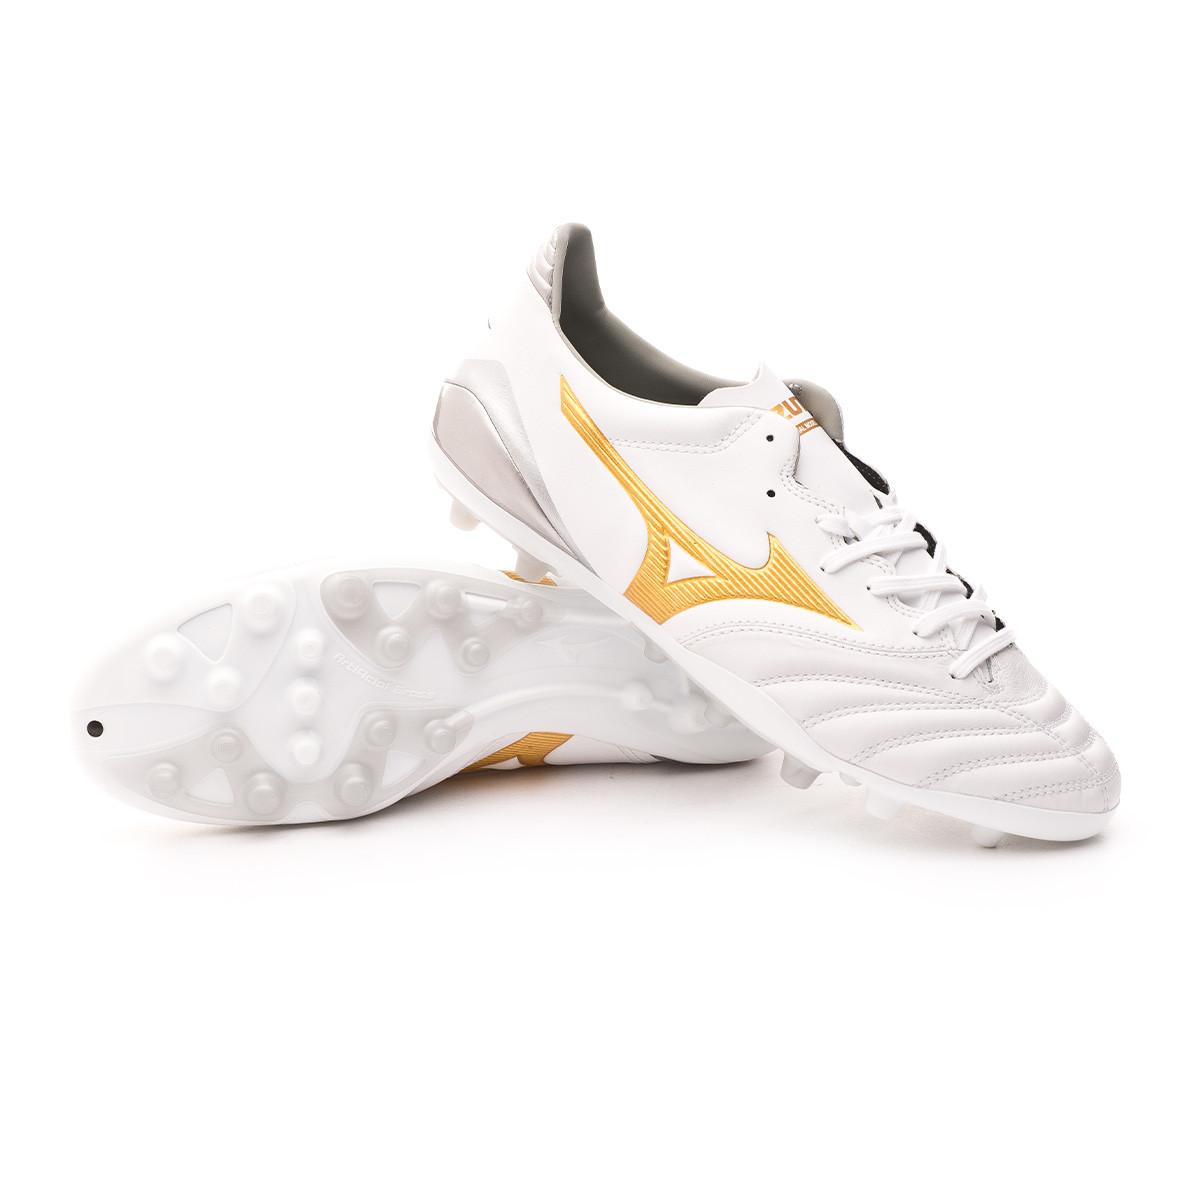 zapatos de futbol mizuno de venta en ecuador libre